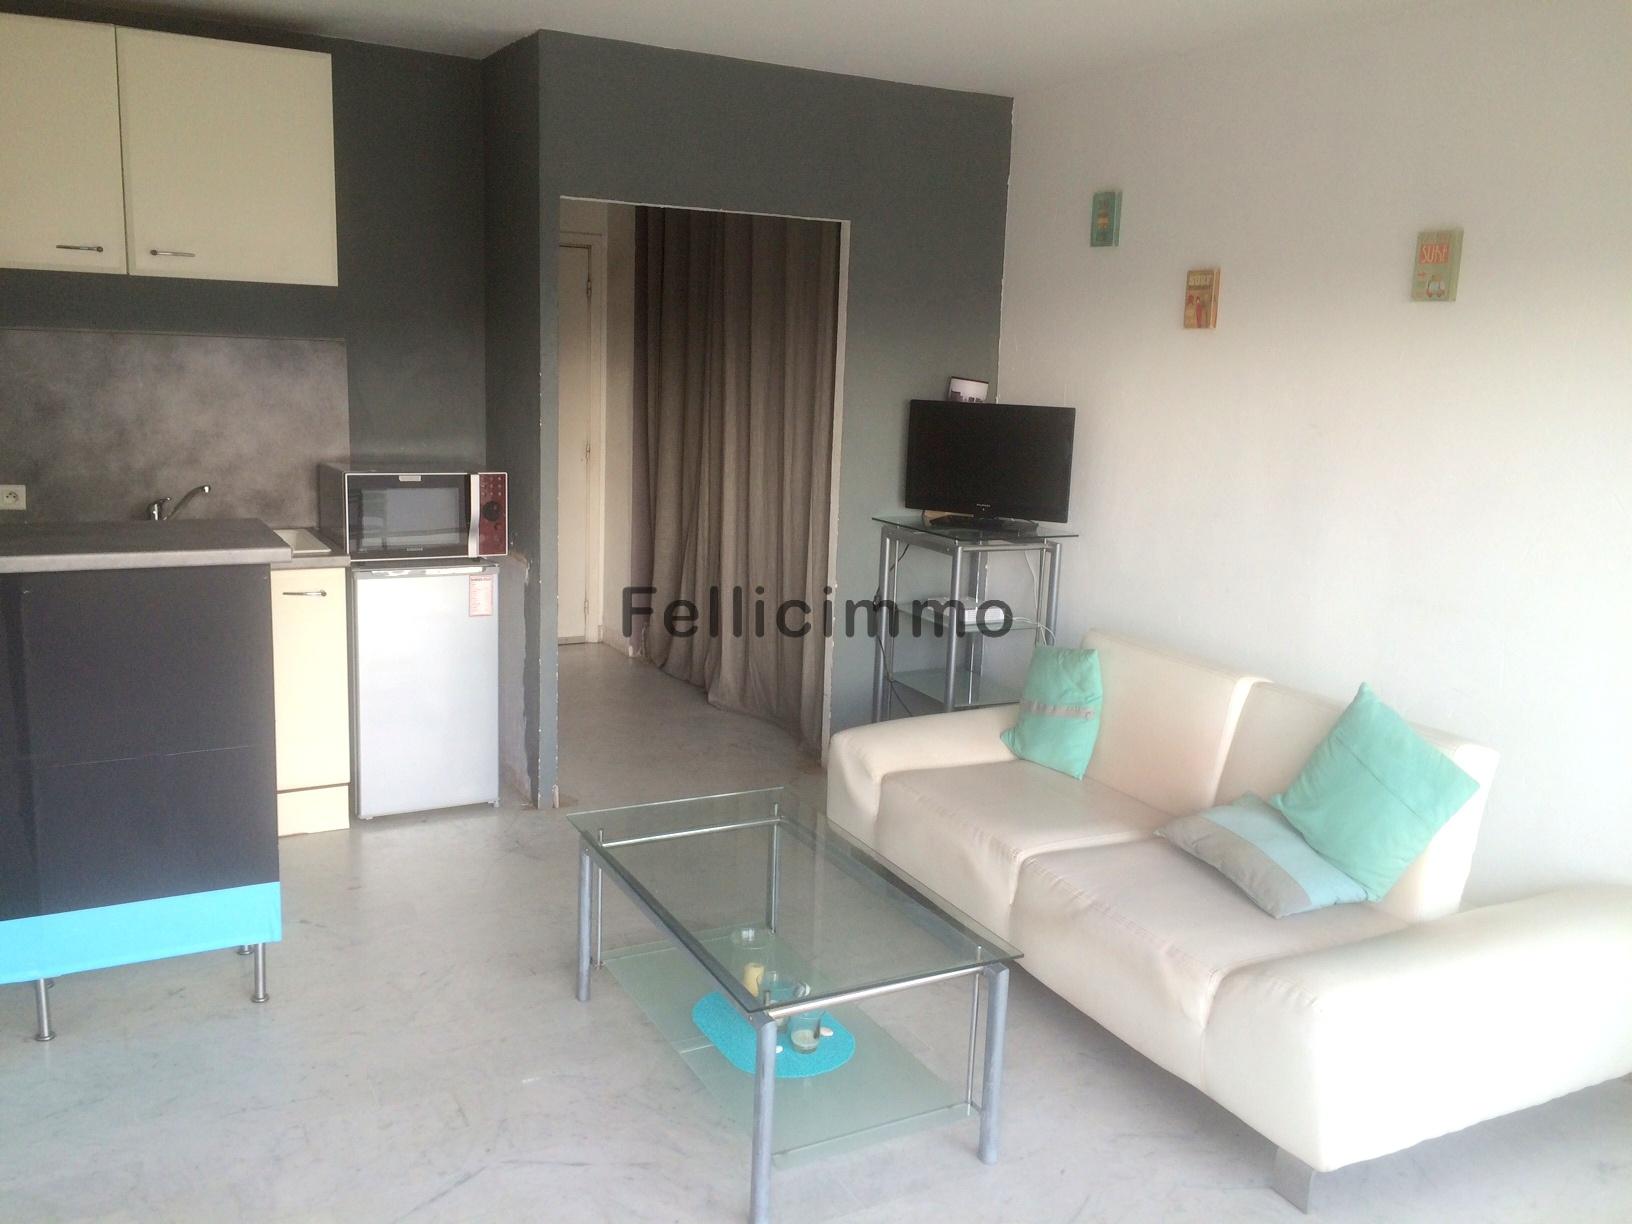 Offres de vente Appartements Antibes (06600)